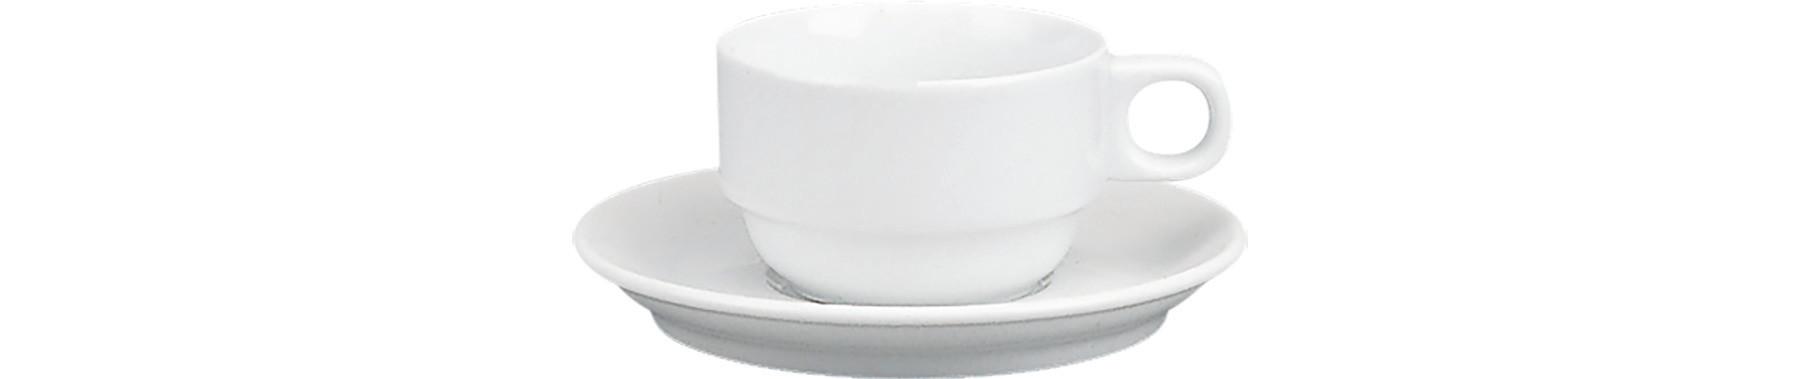 898/598, Tasse nieder stapelbar ø 83 mm / 0,18 l Form 898